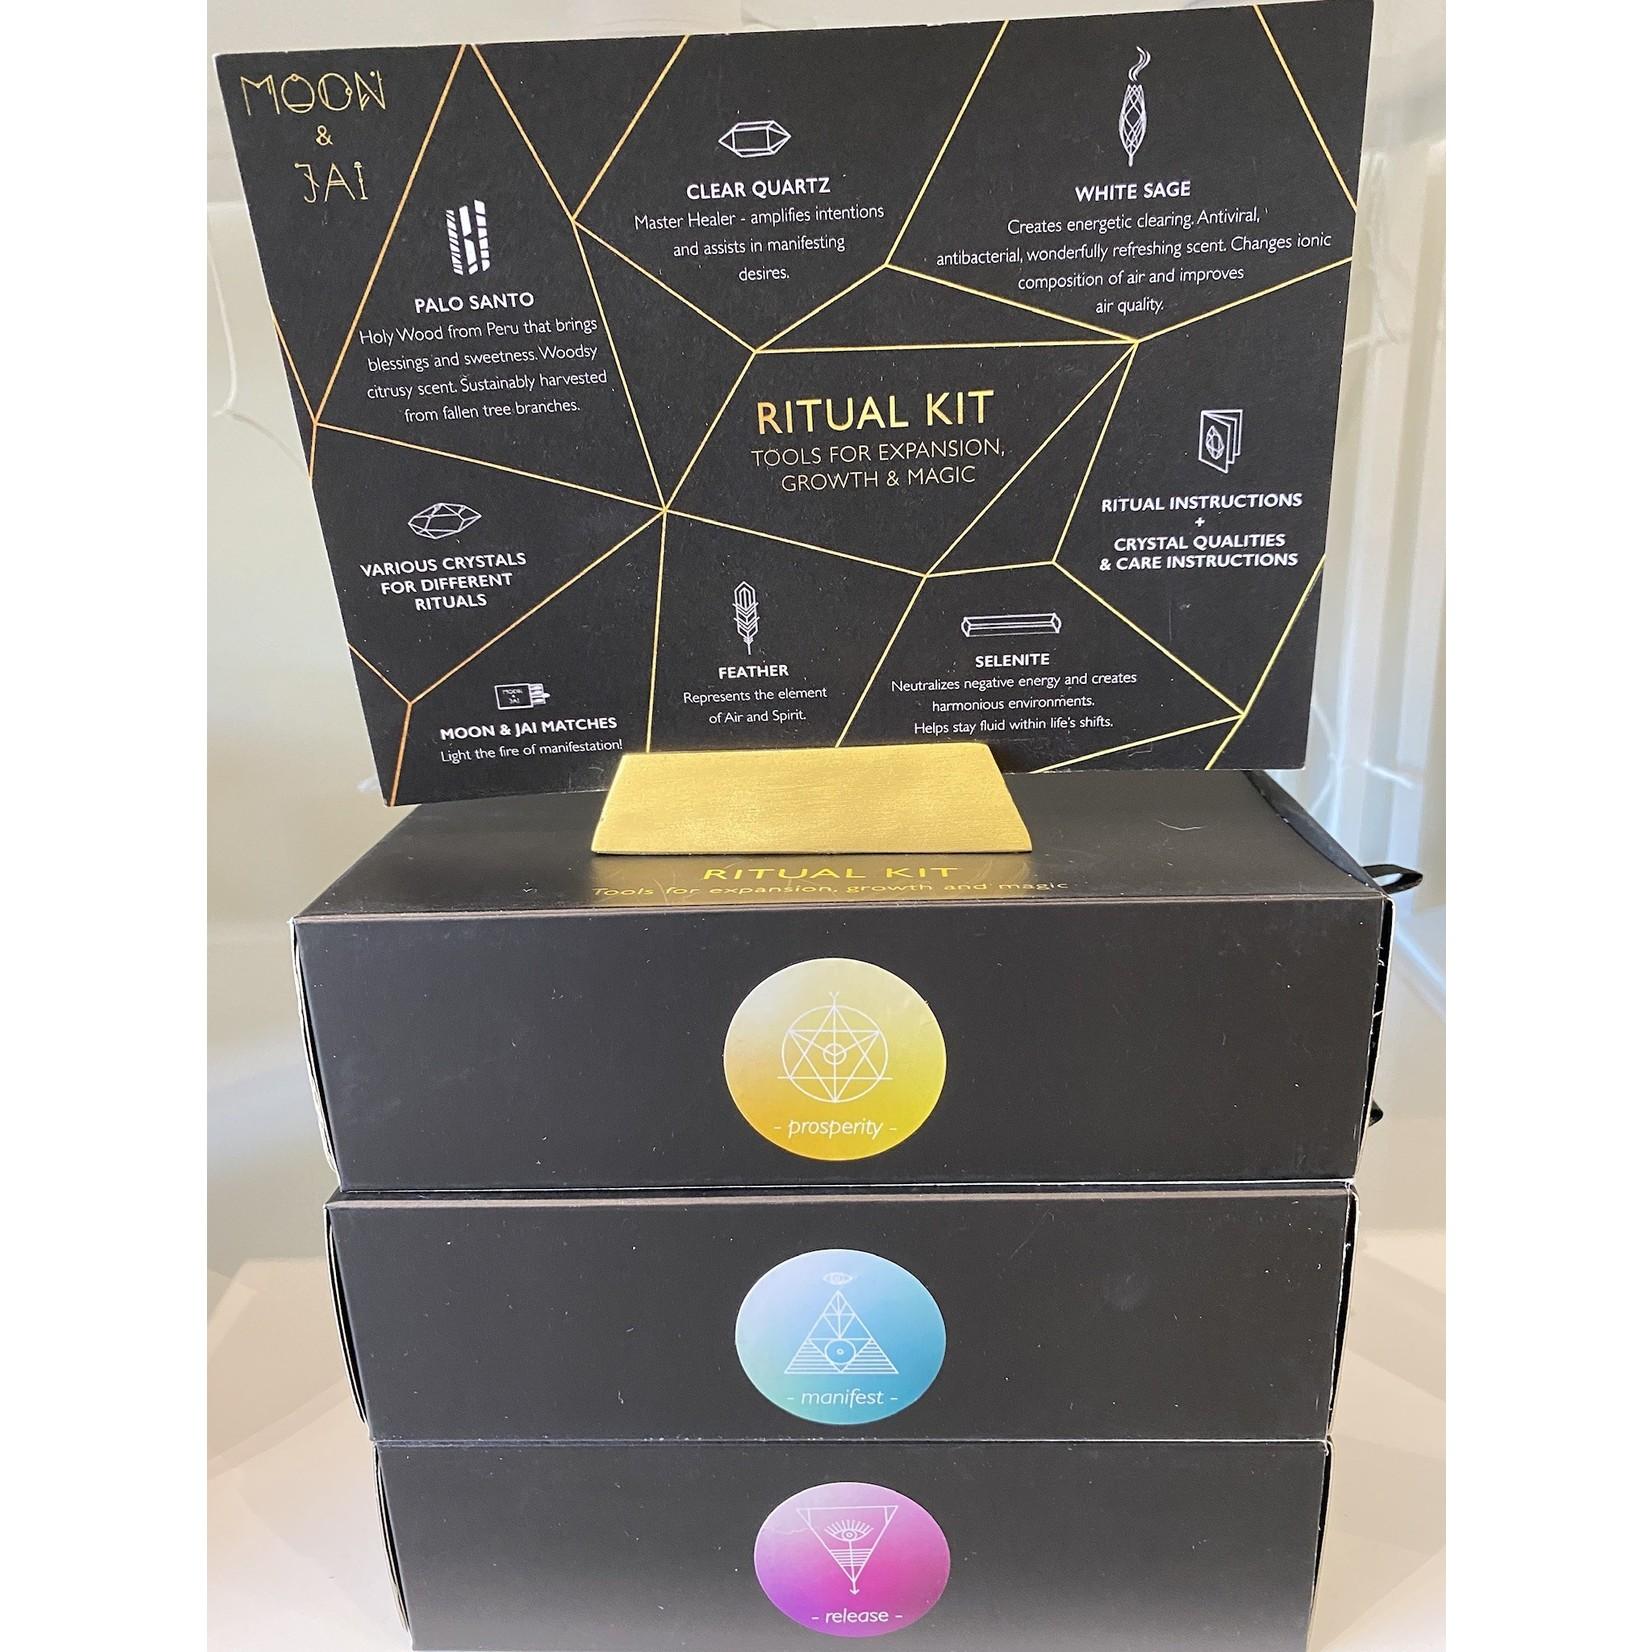 Moon & Jai Ritual Kits/ Tools for expansion, growth, & magic